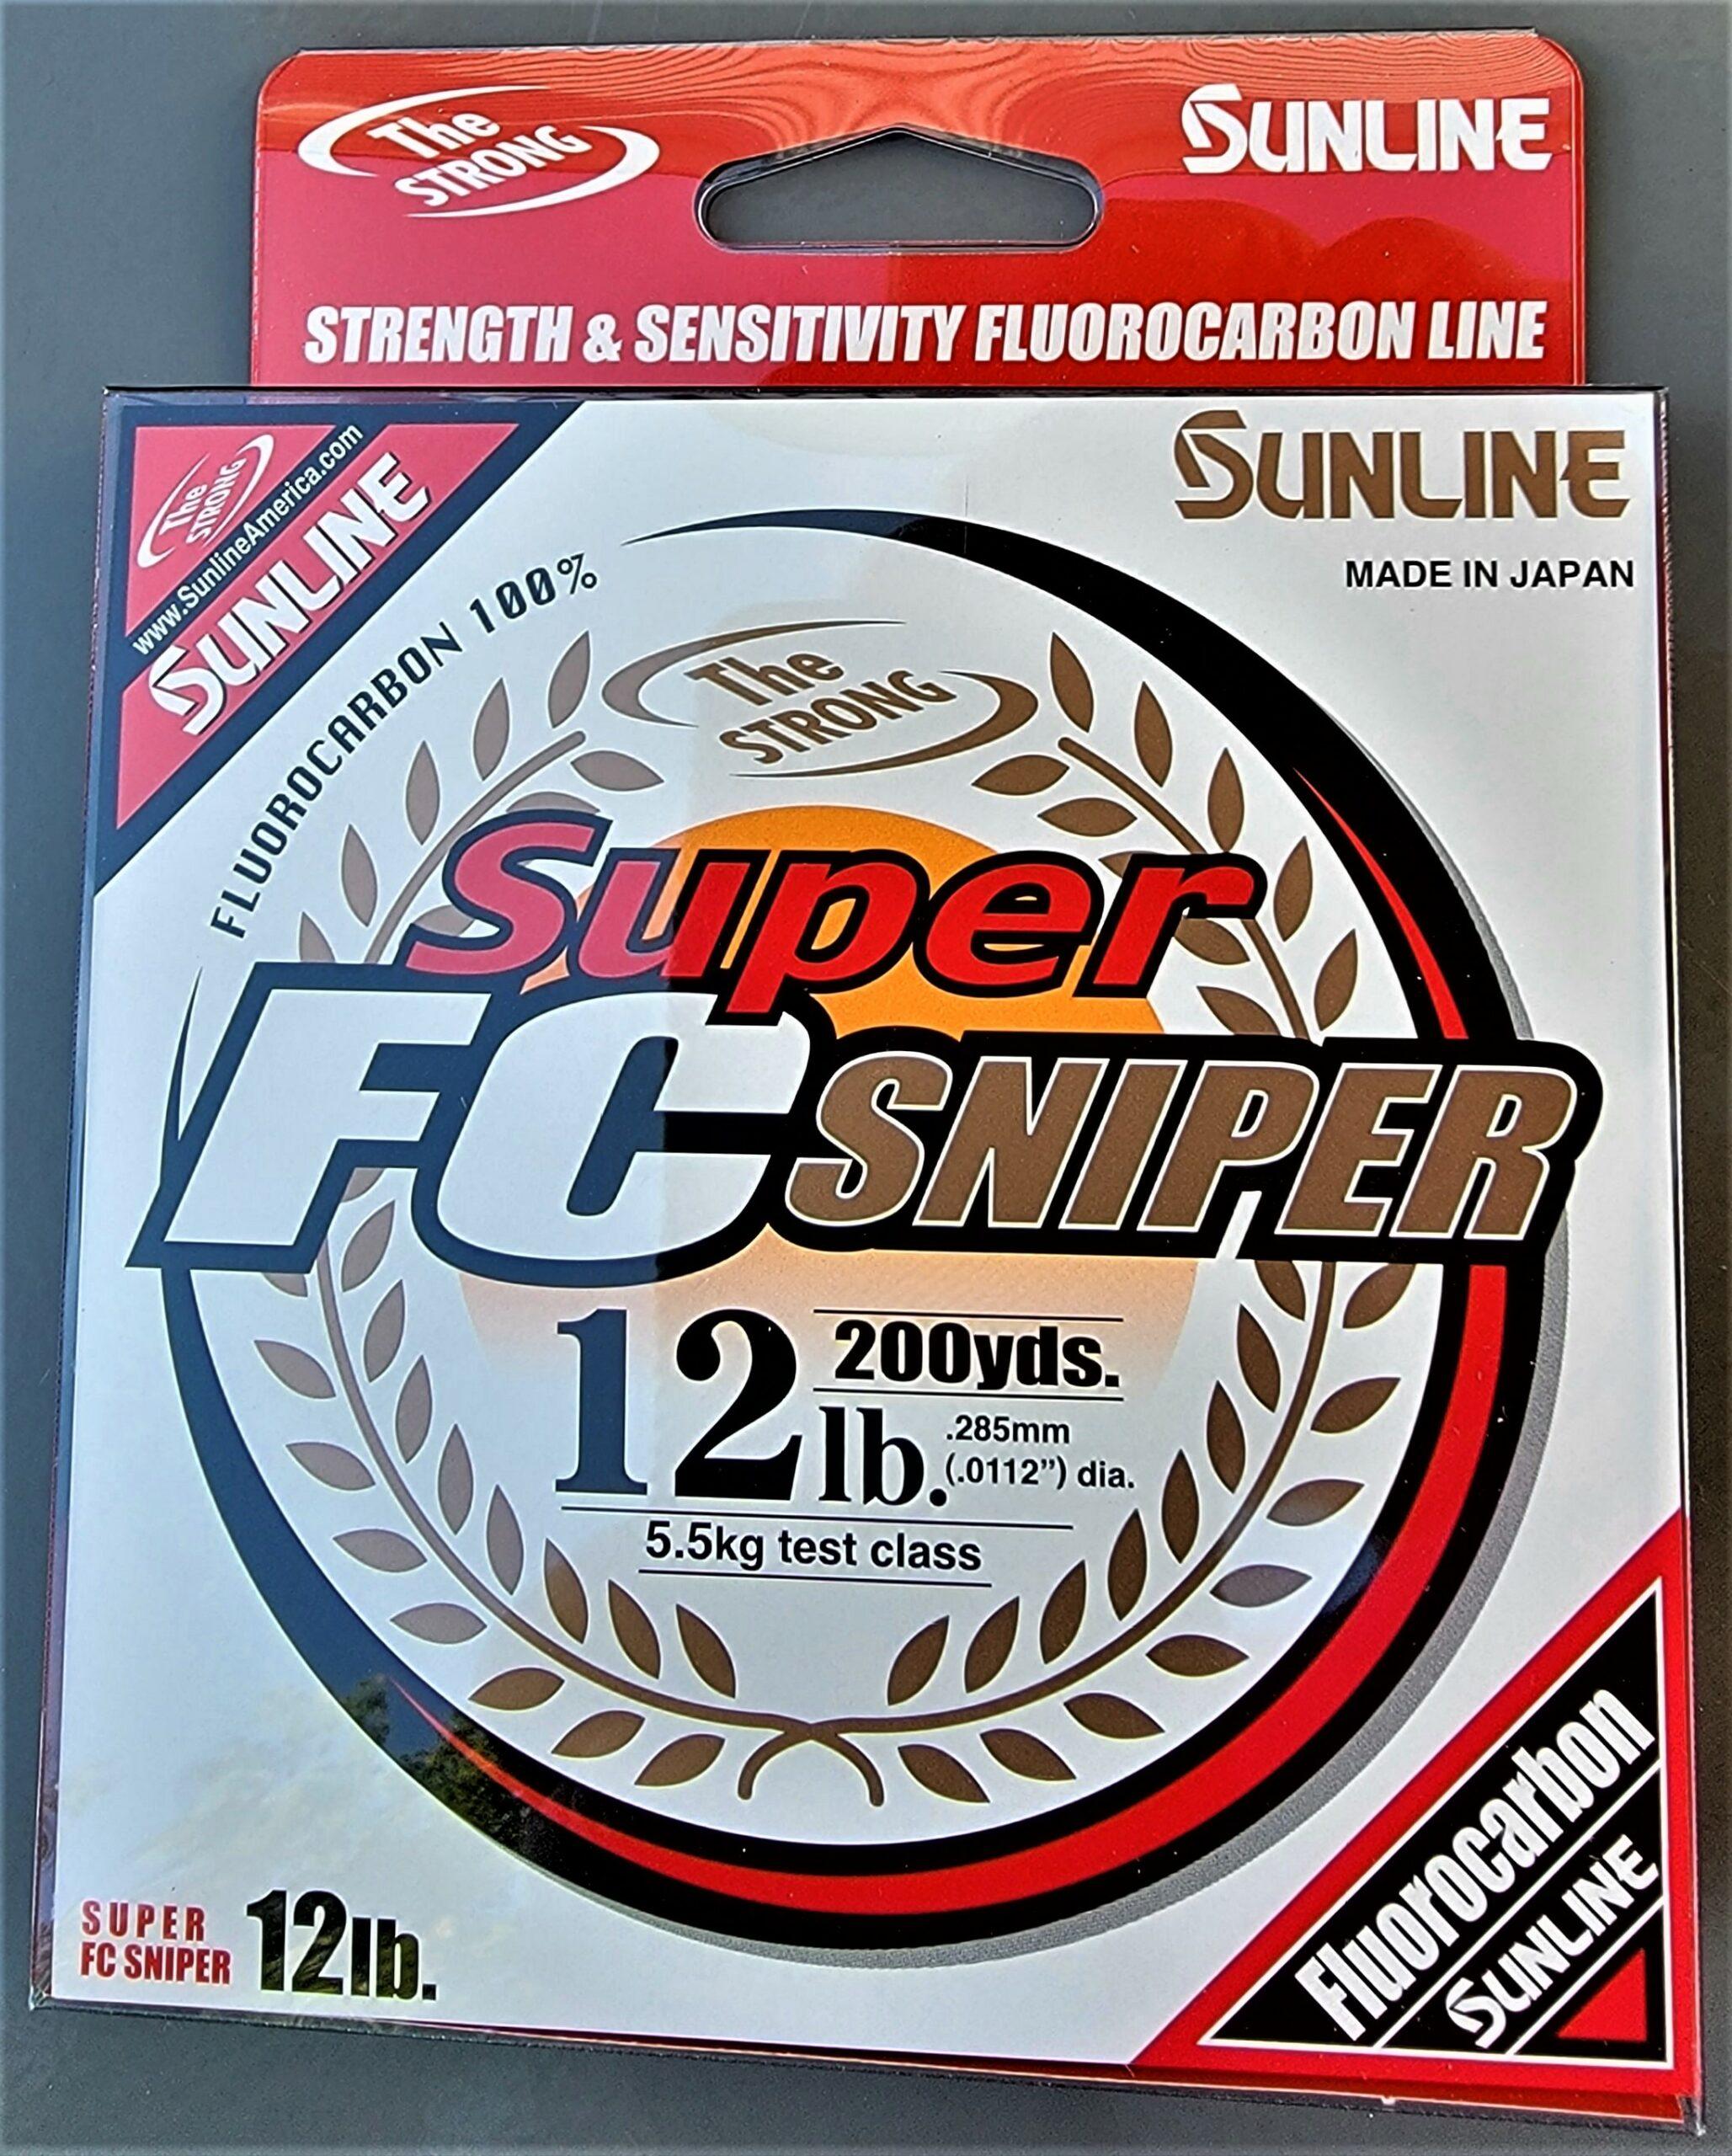 Sunline - Super FC Sniper - 200 YD - Super FC Sniper - 12 LB - Natural Clear